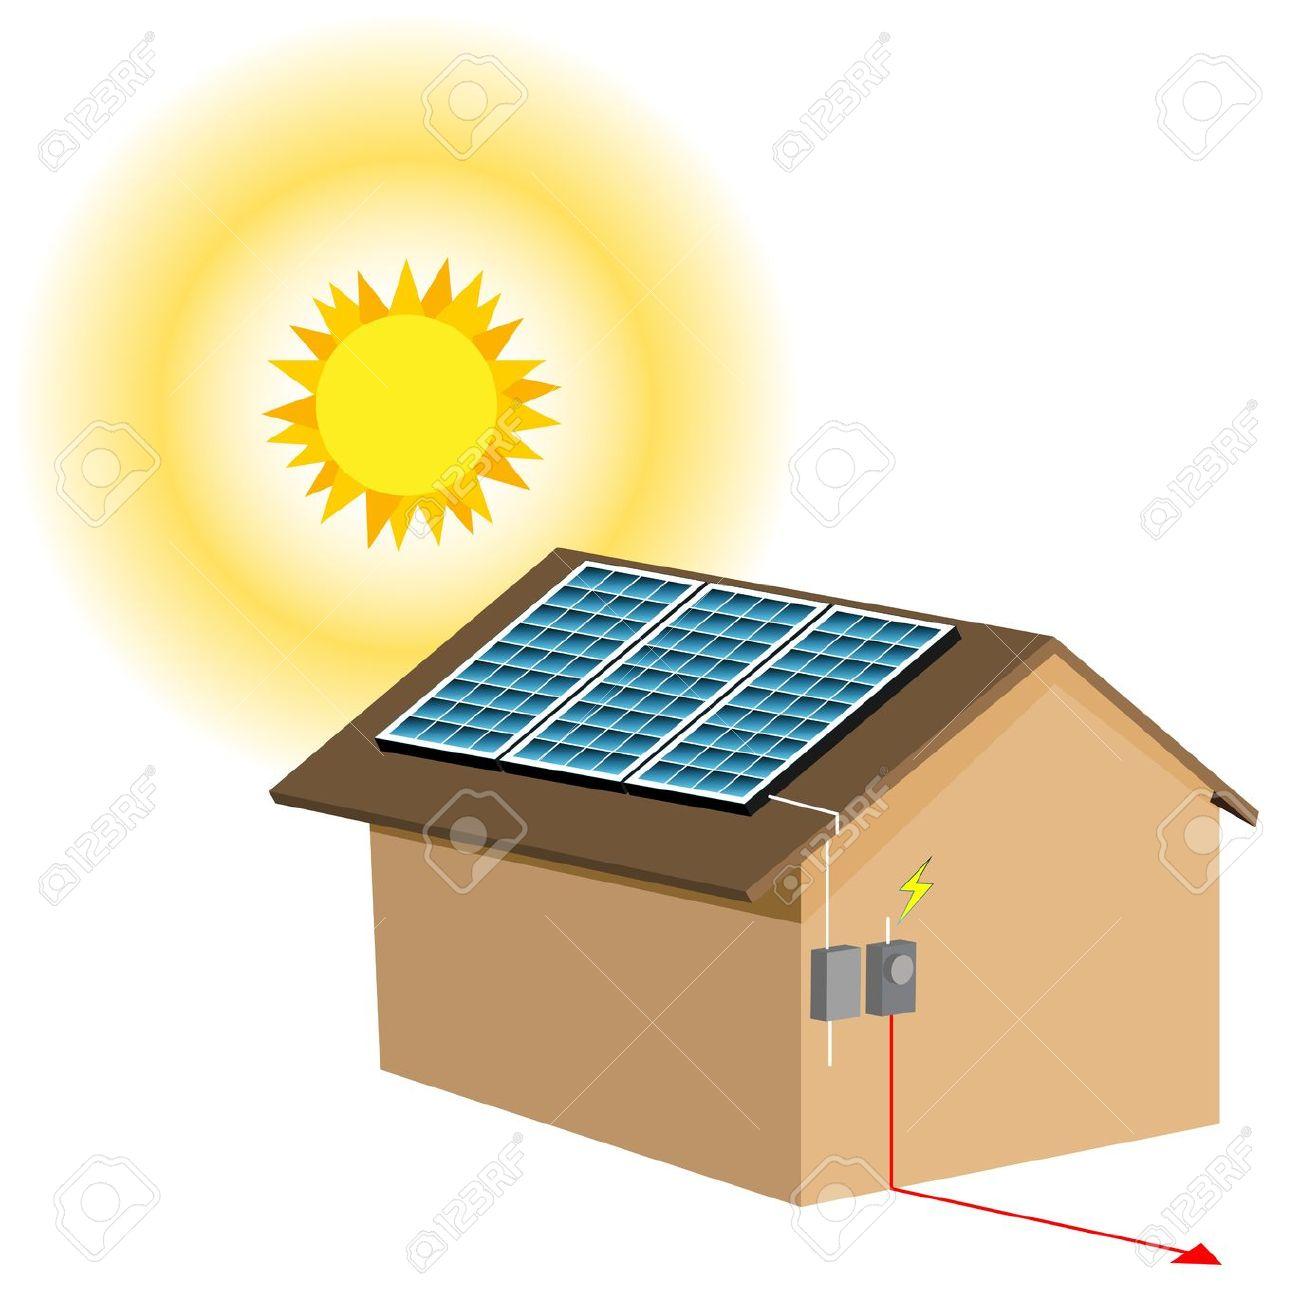 clip art solar power - photo #34